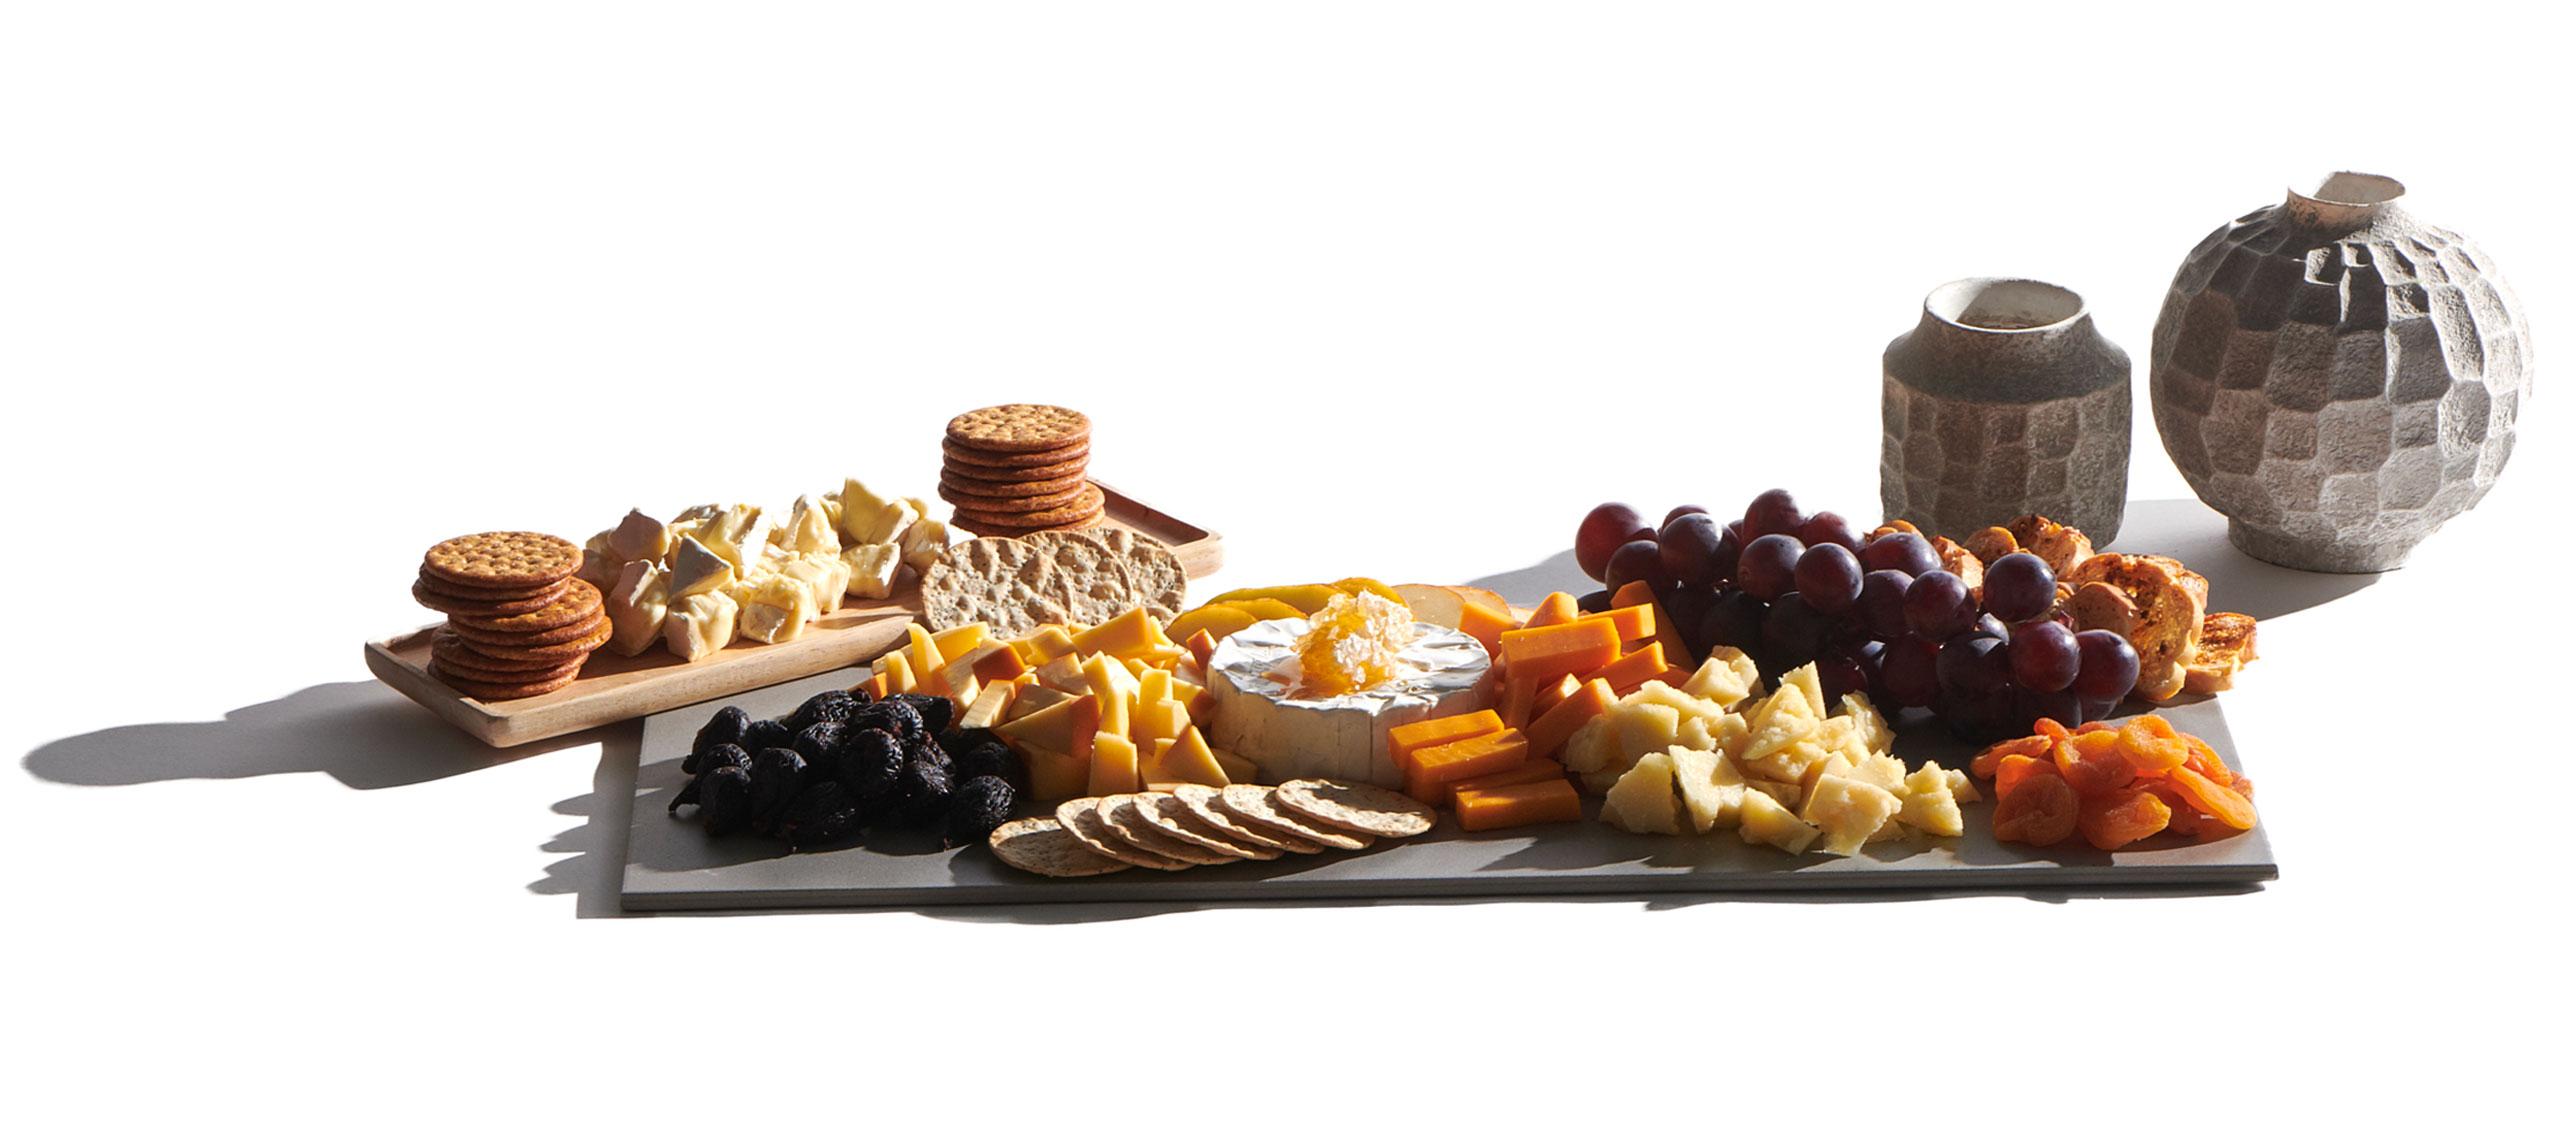 Fruit & Cheese Grazing Board